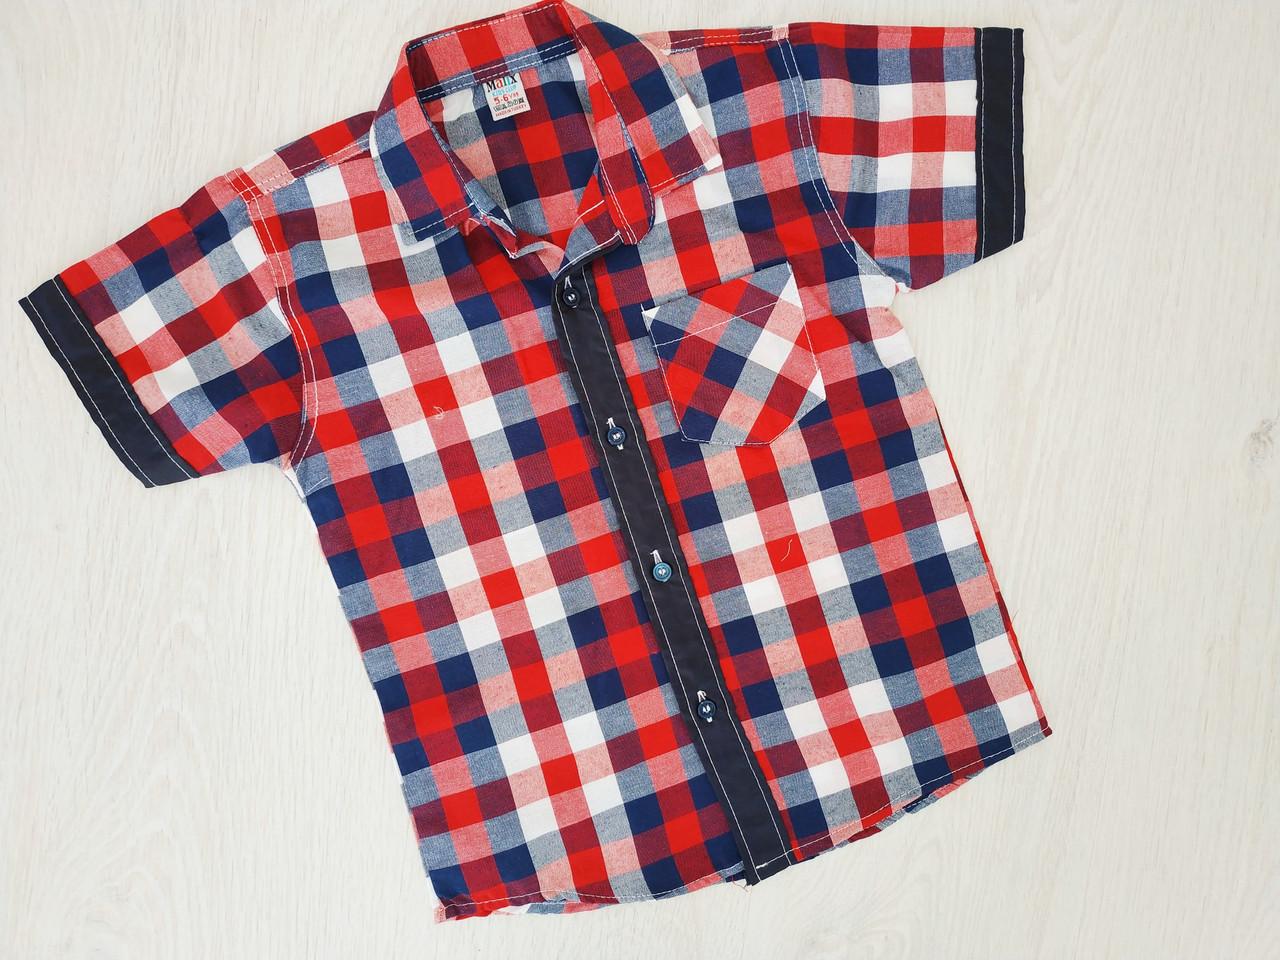 Рубашка для мальчика, Турция, Babexi, арт. 38591